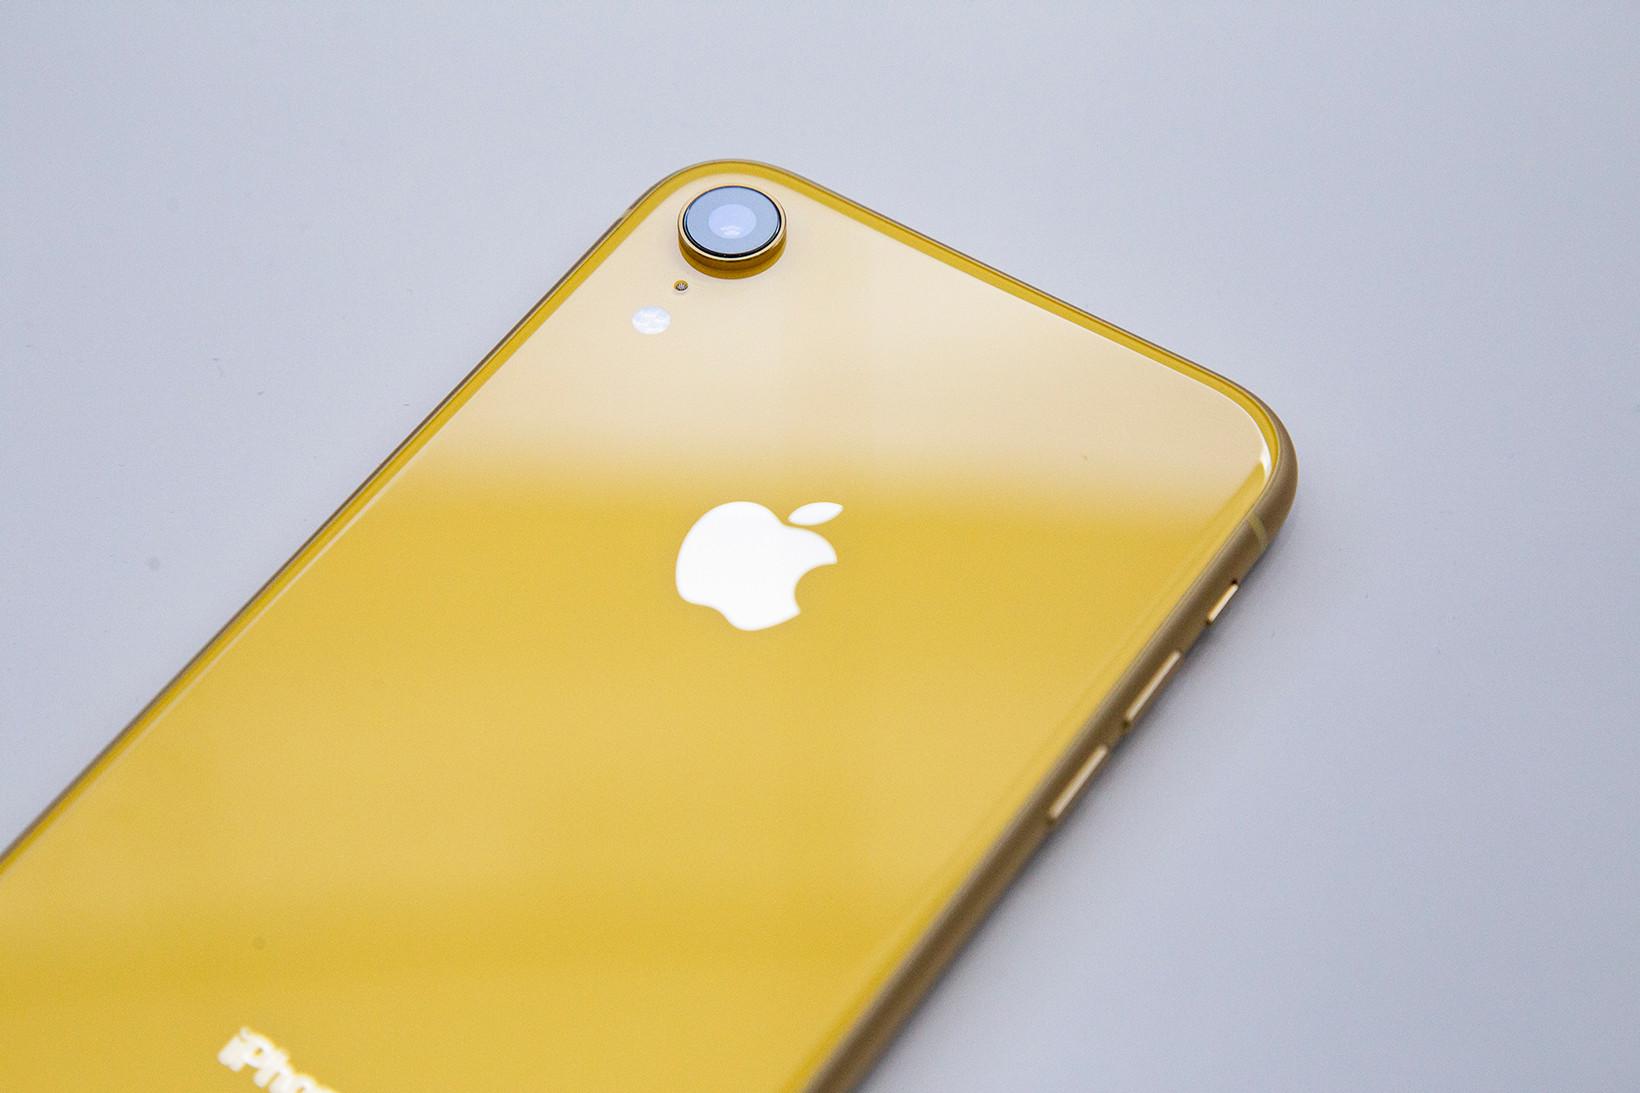 Ремонт iPhone XR - фото 1 | Сервисный центр Total Apple